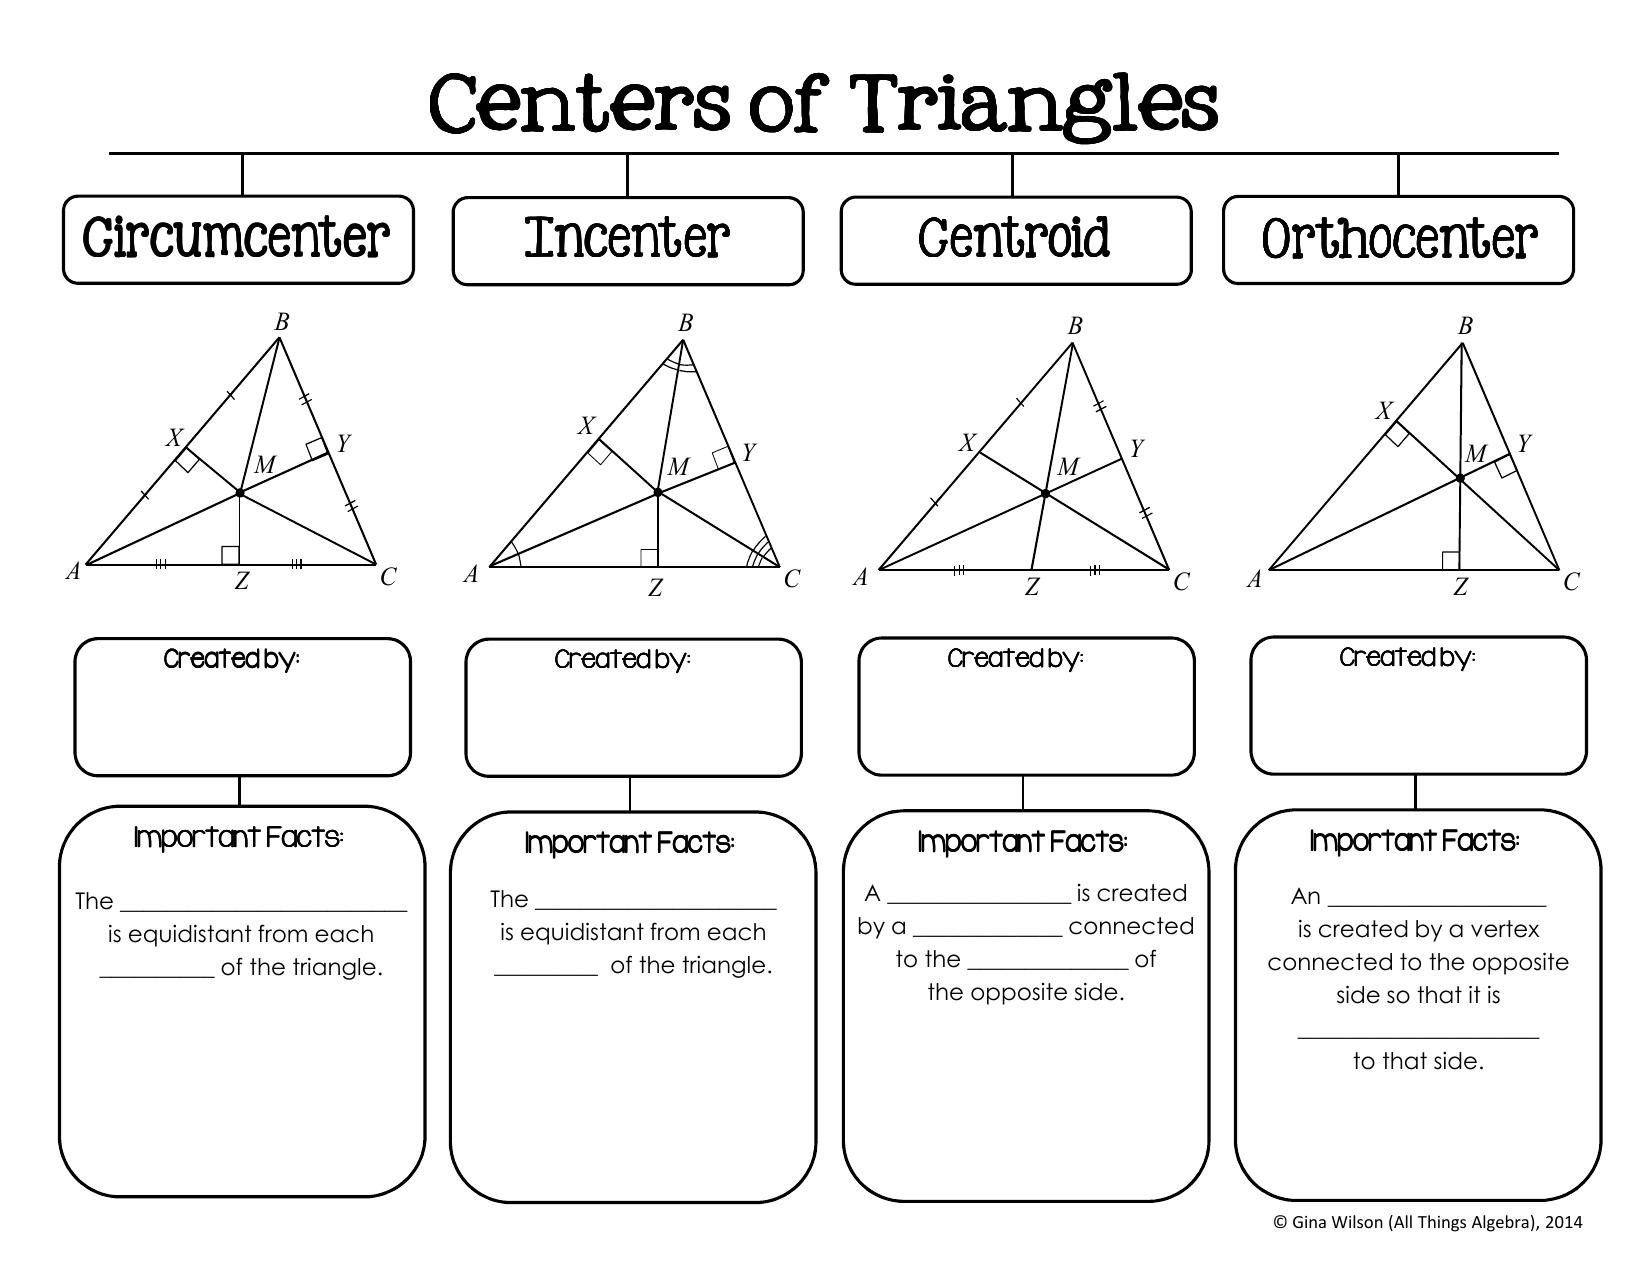 CentersofTriangles-GraphicOrganizer